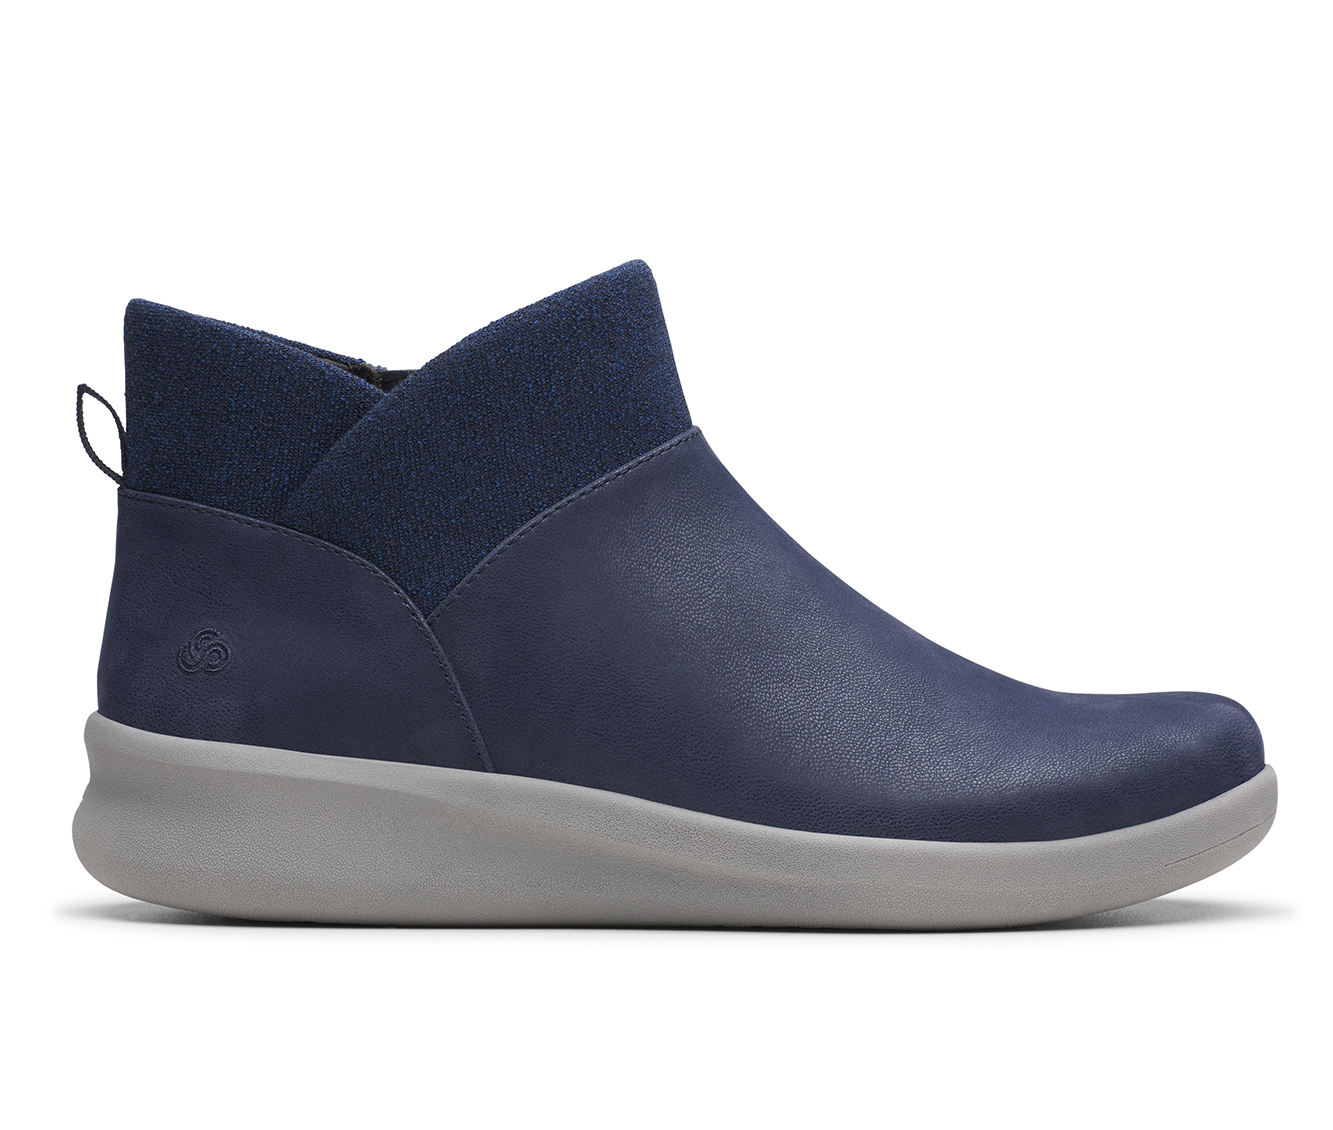 Clarks Sillian 2.0 Dusk Women's Boots (Blue - Canvas)